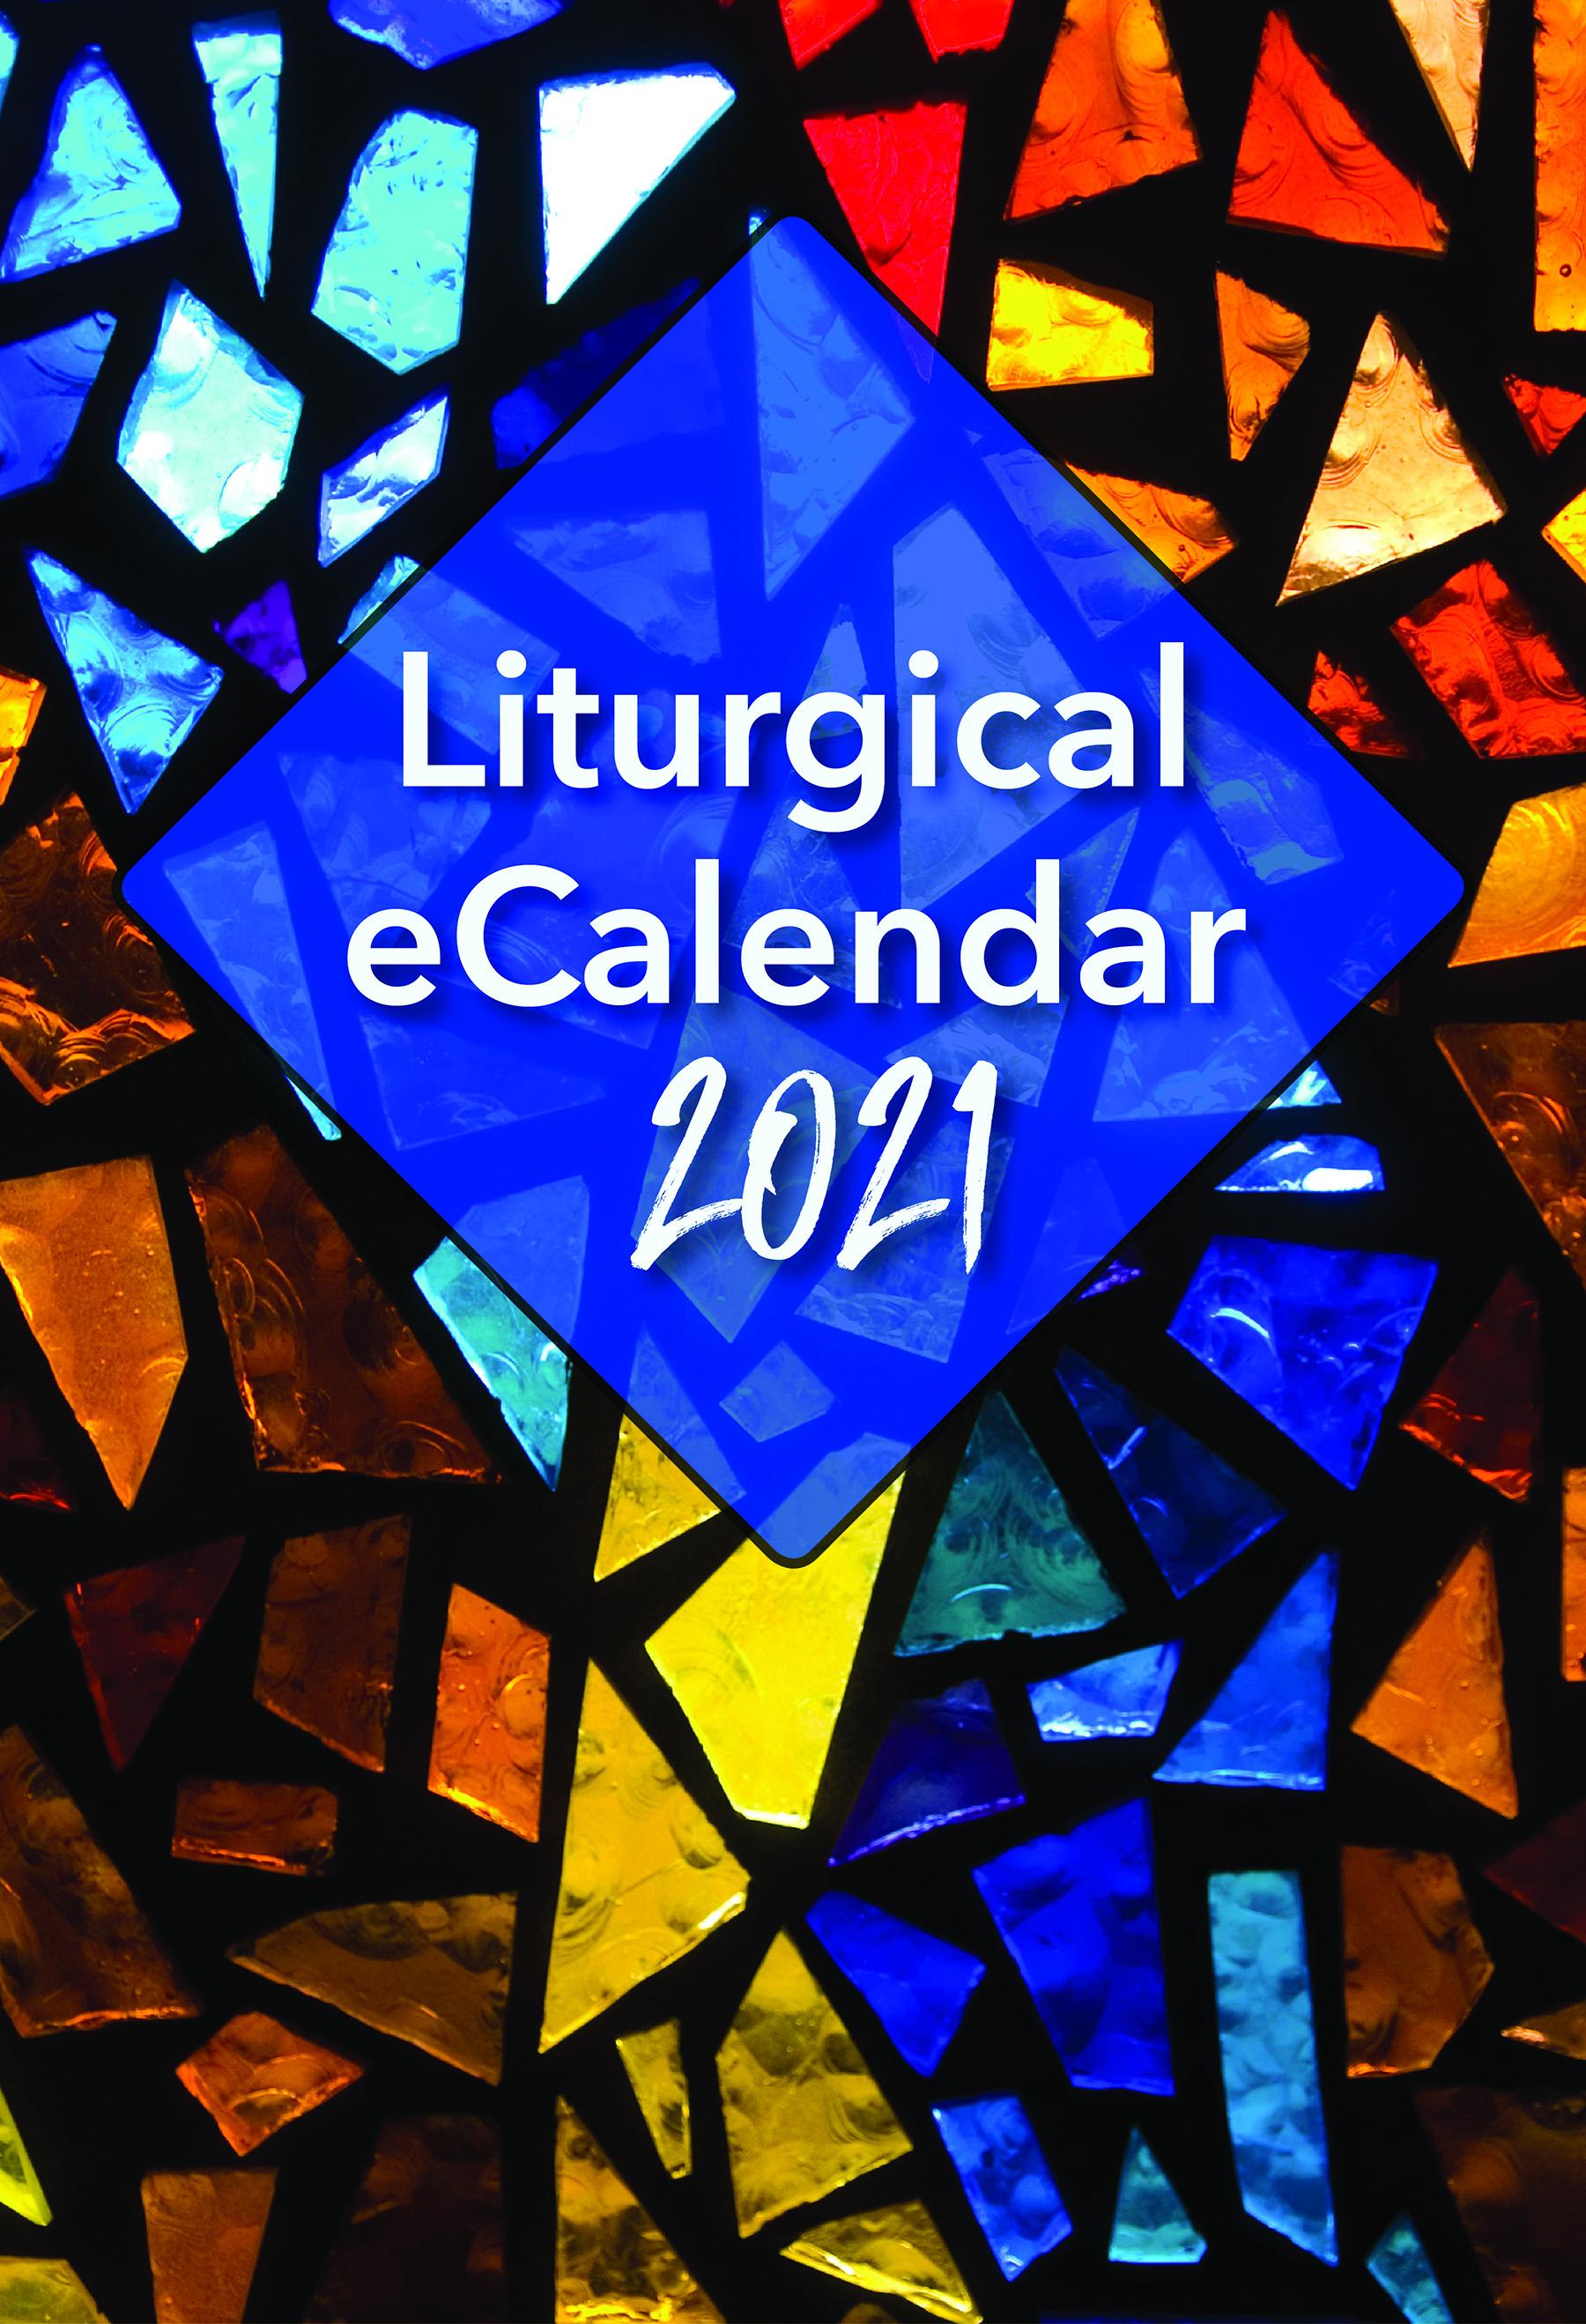 ChurchPublishing.org: Liturgical eCalendar 2021